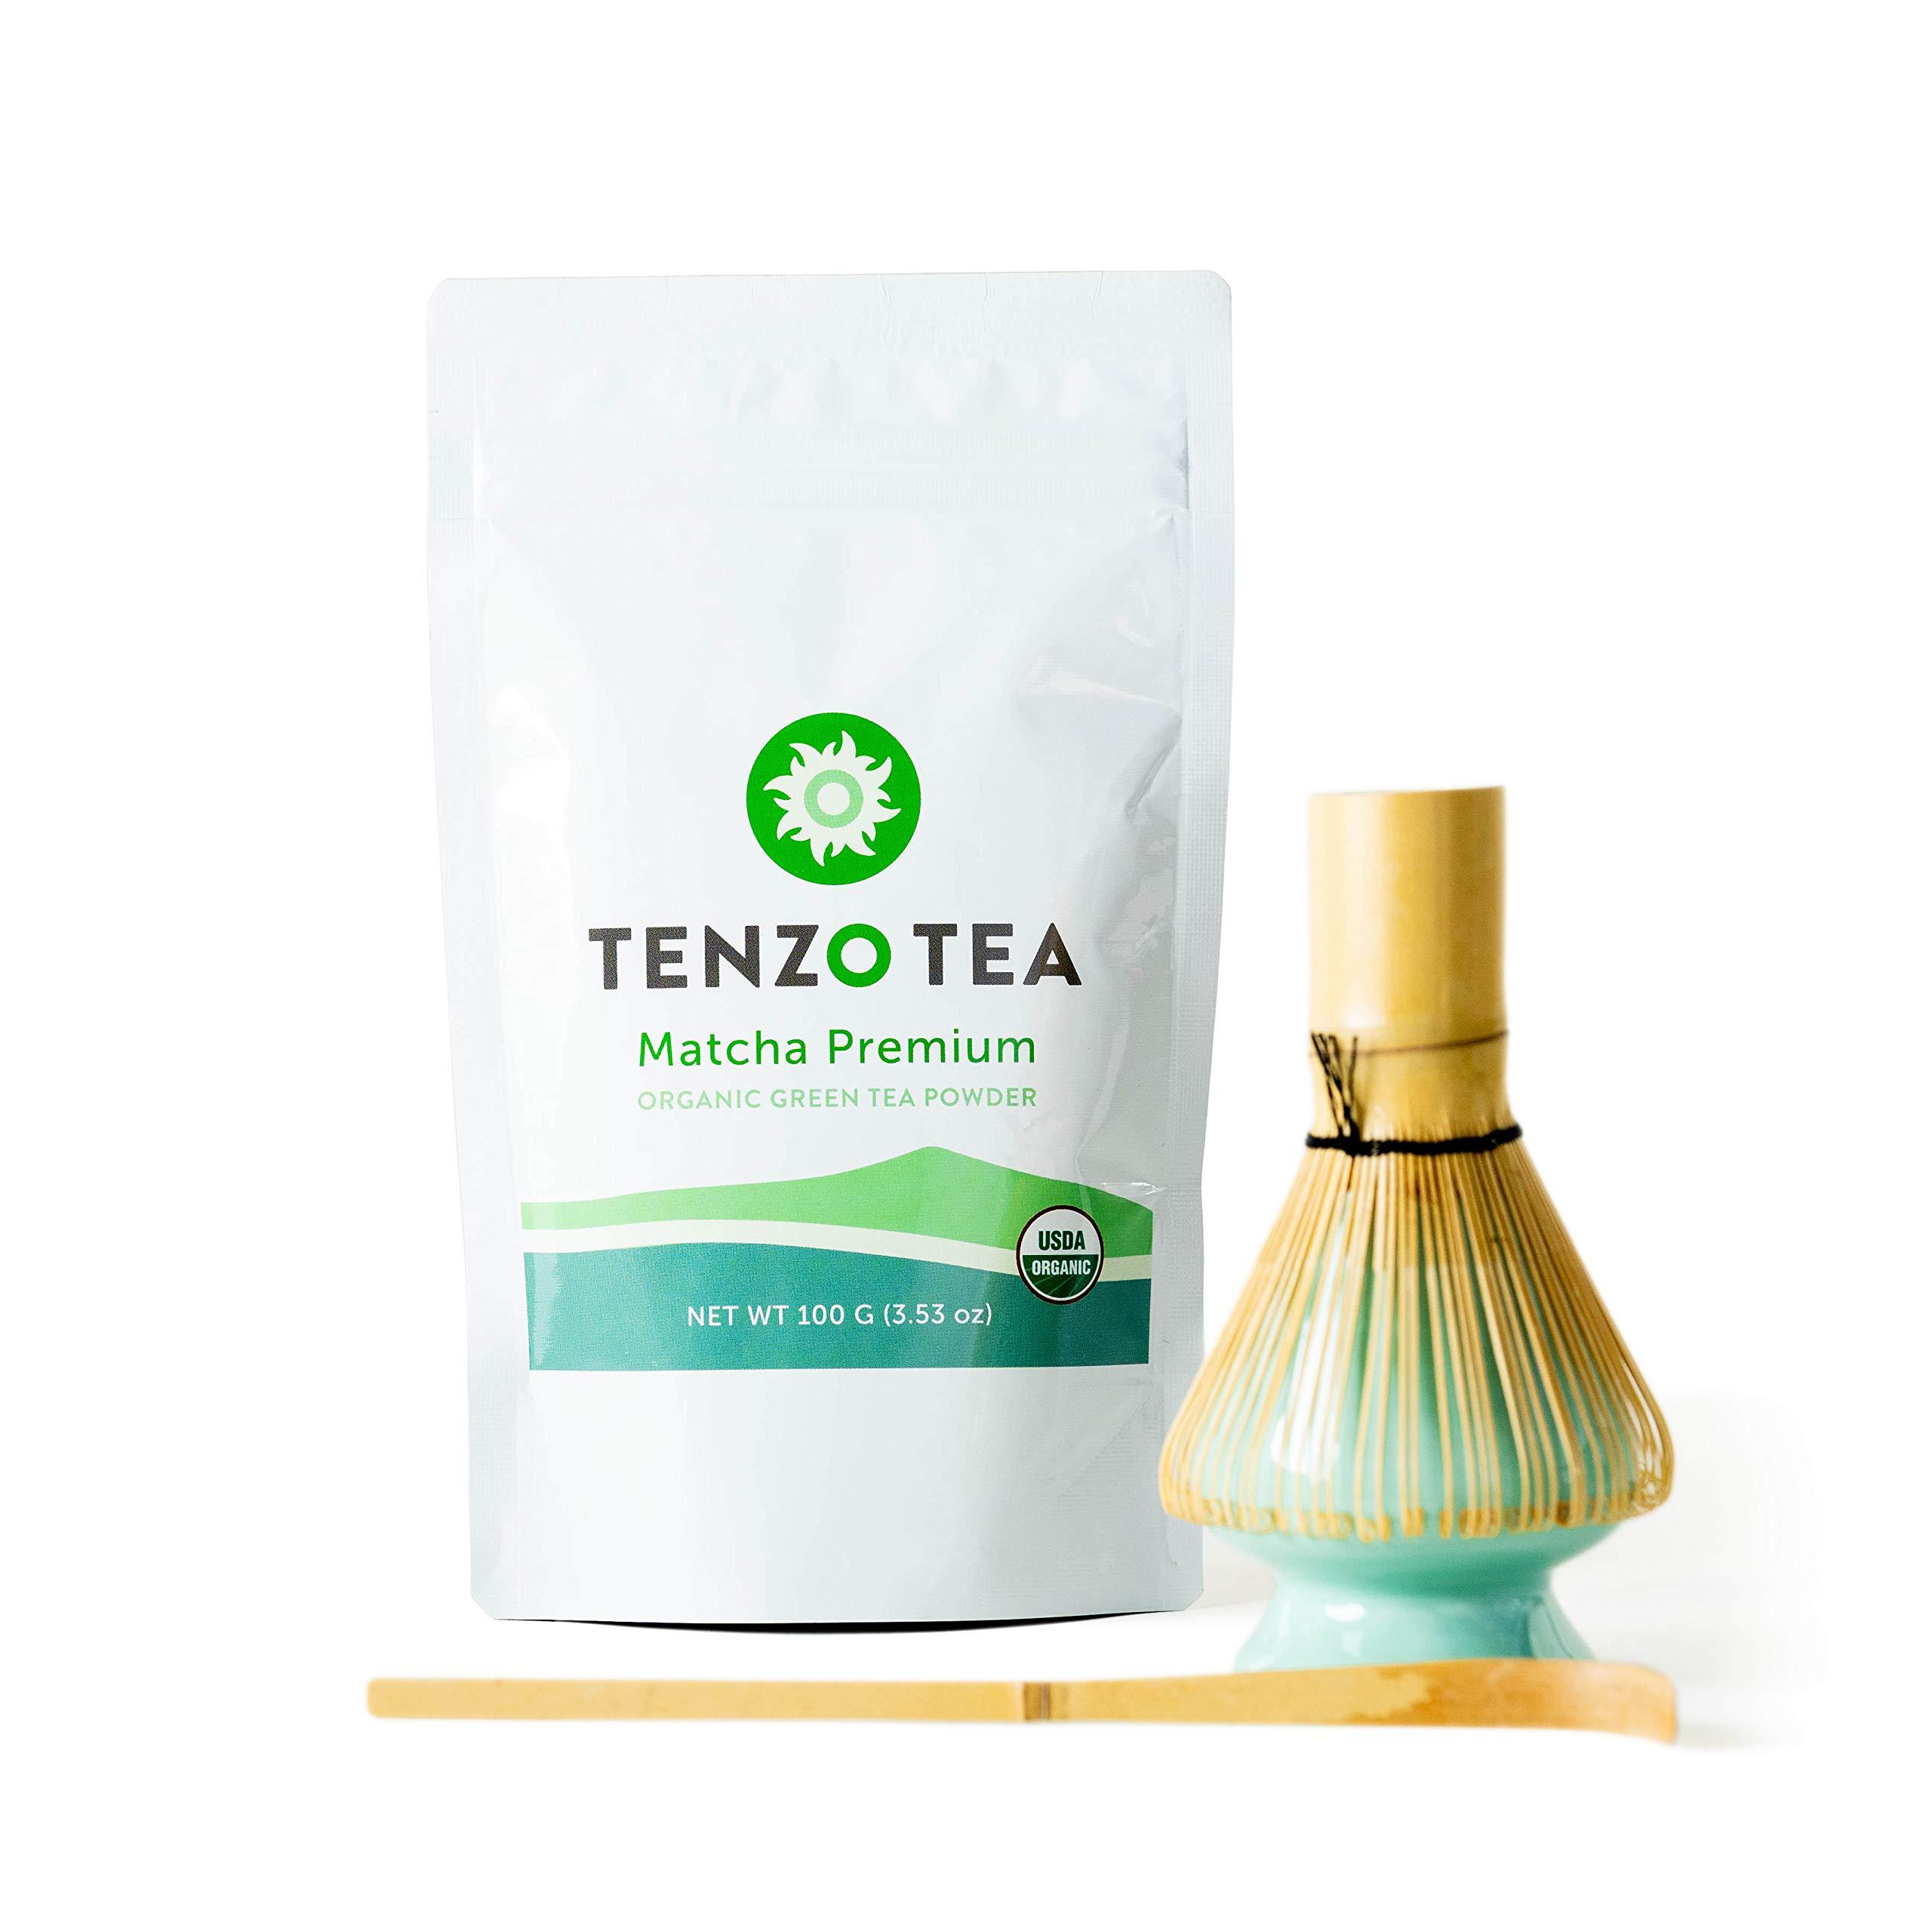 Tenzo Tea - Premium Starter Kit (Ceremonial Grade Matcha) - Whisk, Whisk Stand, Scoop, Matcha - USDA Organic, Kosher, Vegan, Paleo/Keto Friendly (100 Gram - Starter Kit)